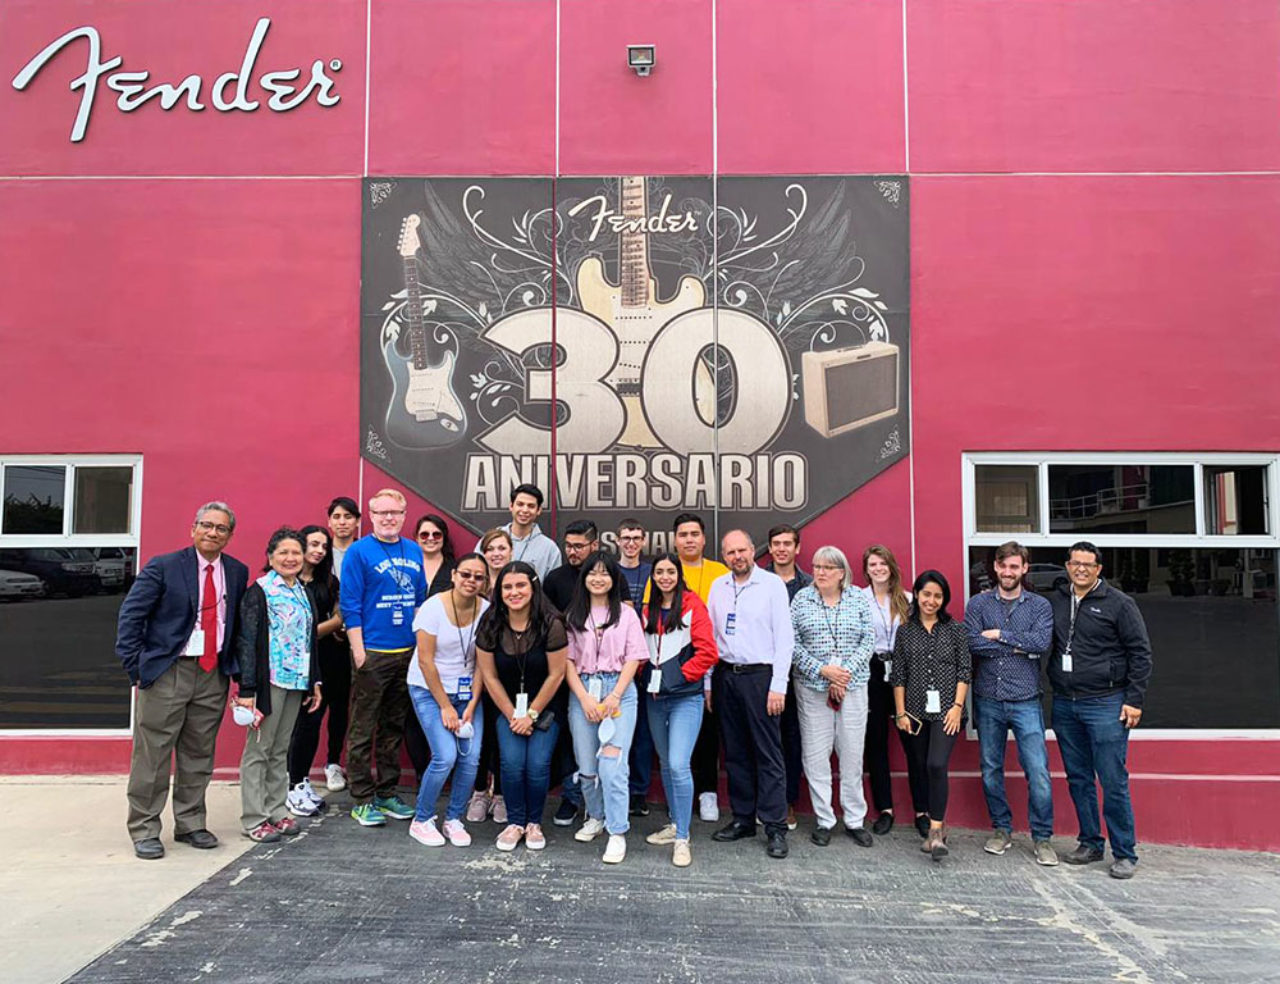 Students visit Fender's international site.